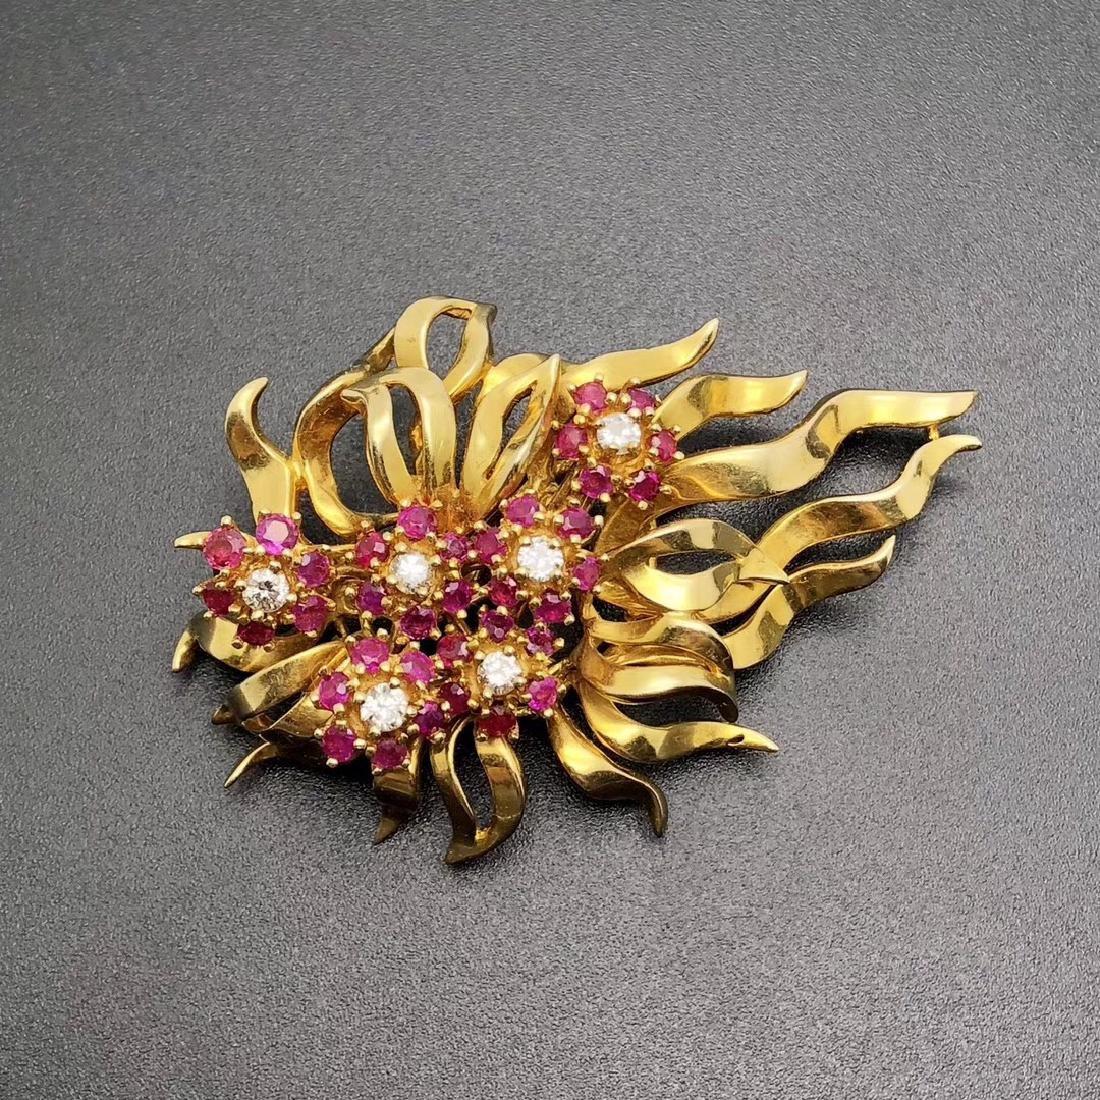 1960S FRENCH 18K GOLD RUBY DIAMOND BROOCH